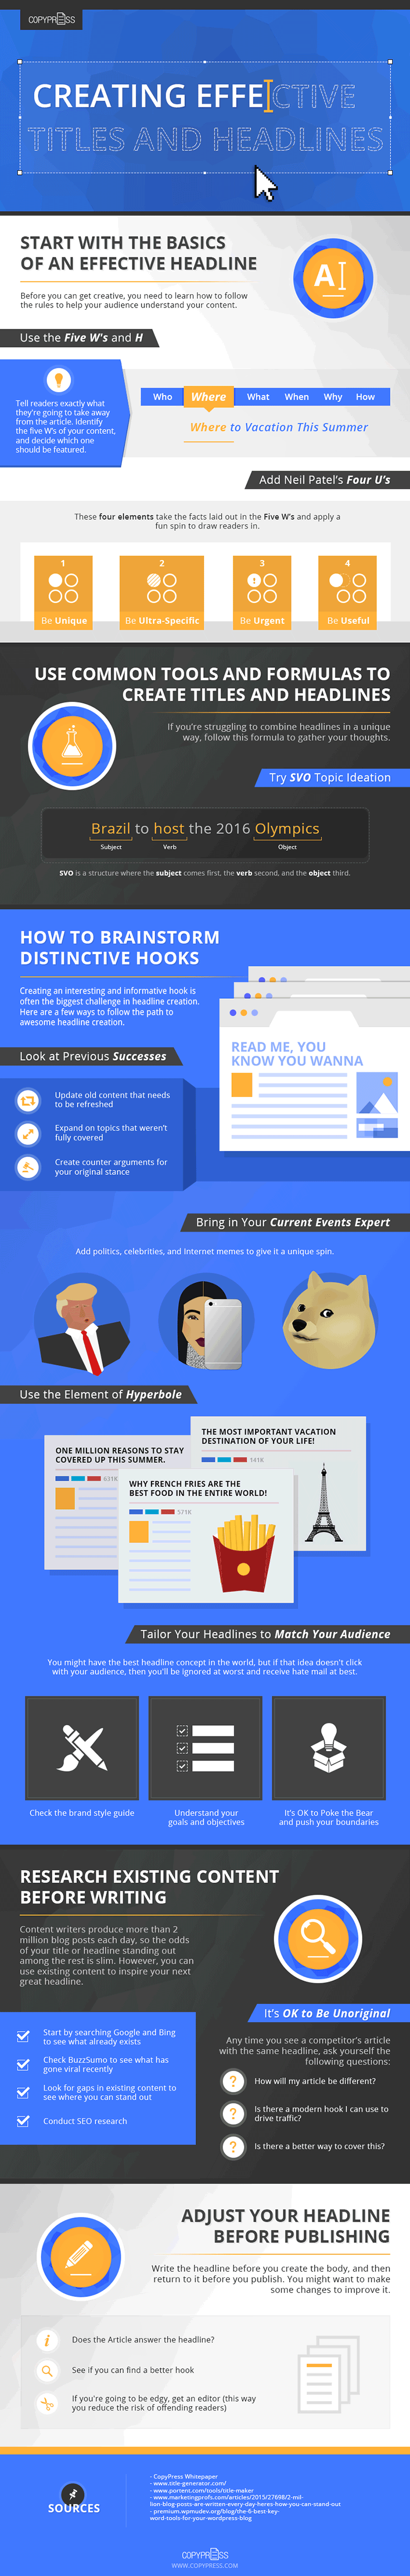 infographic news headlines by - photo #15